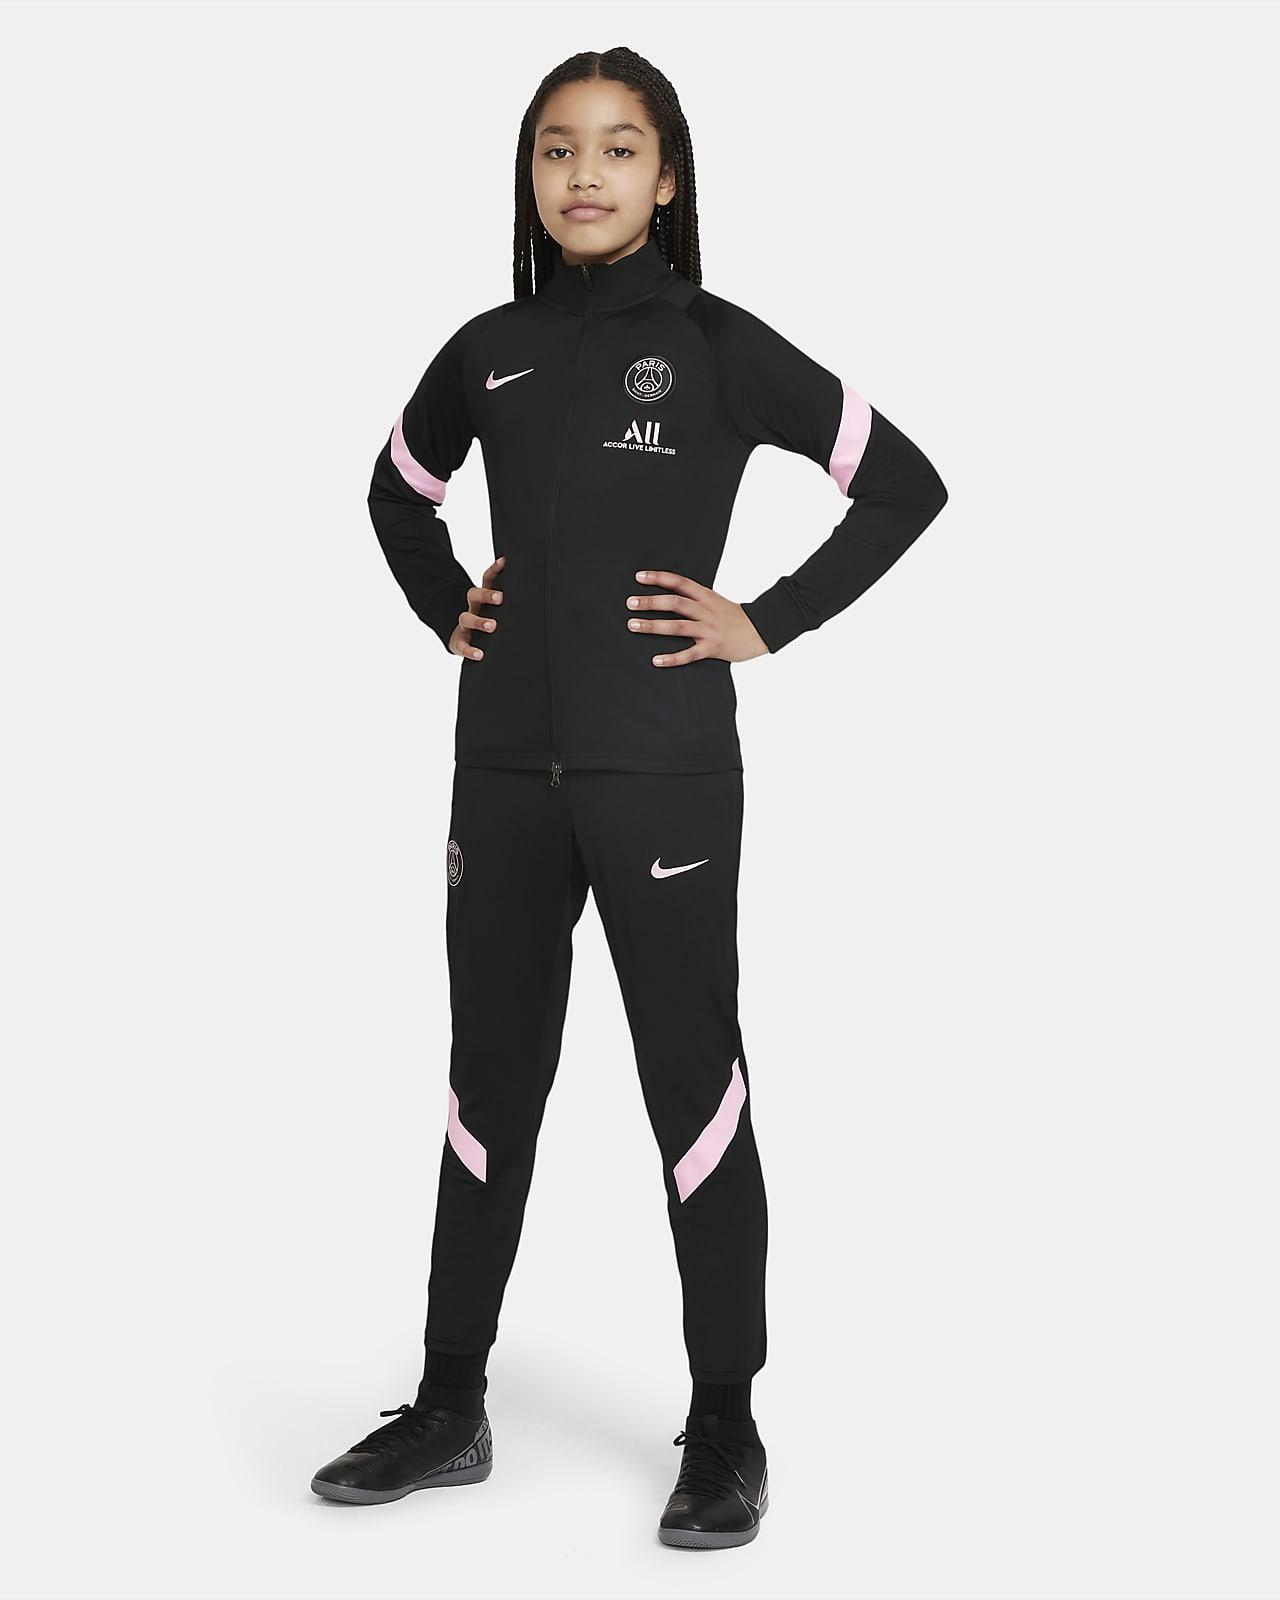 Segona equipació Strike París Saint-Germain Xandall Nike Dri-FIT de futbol - Nen/a